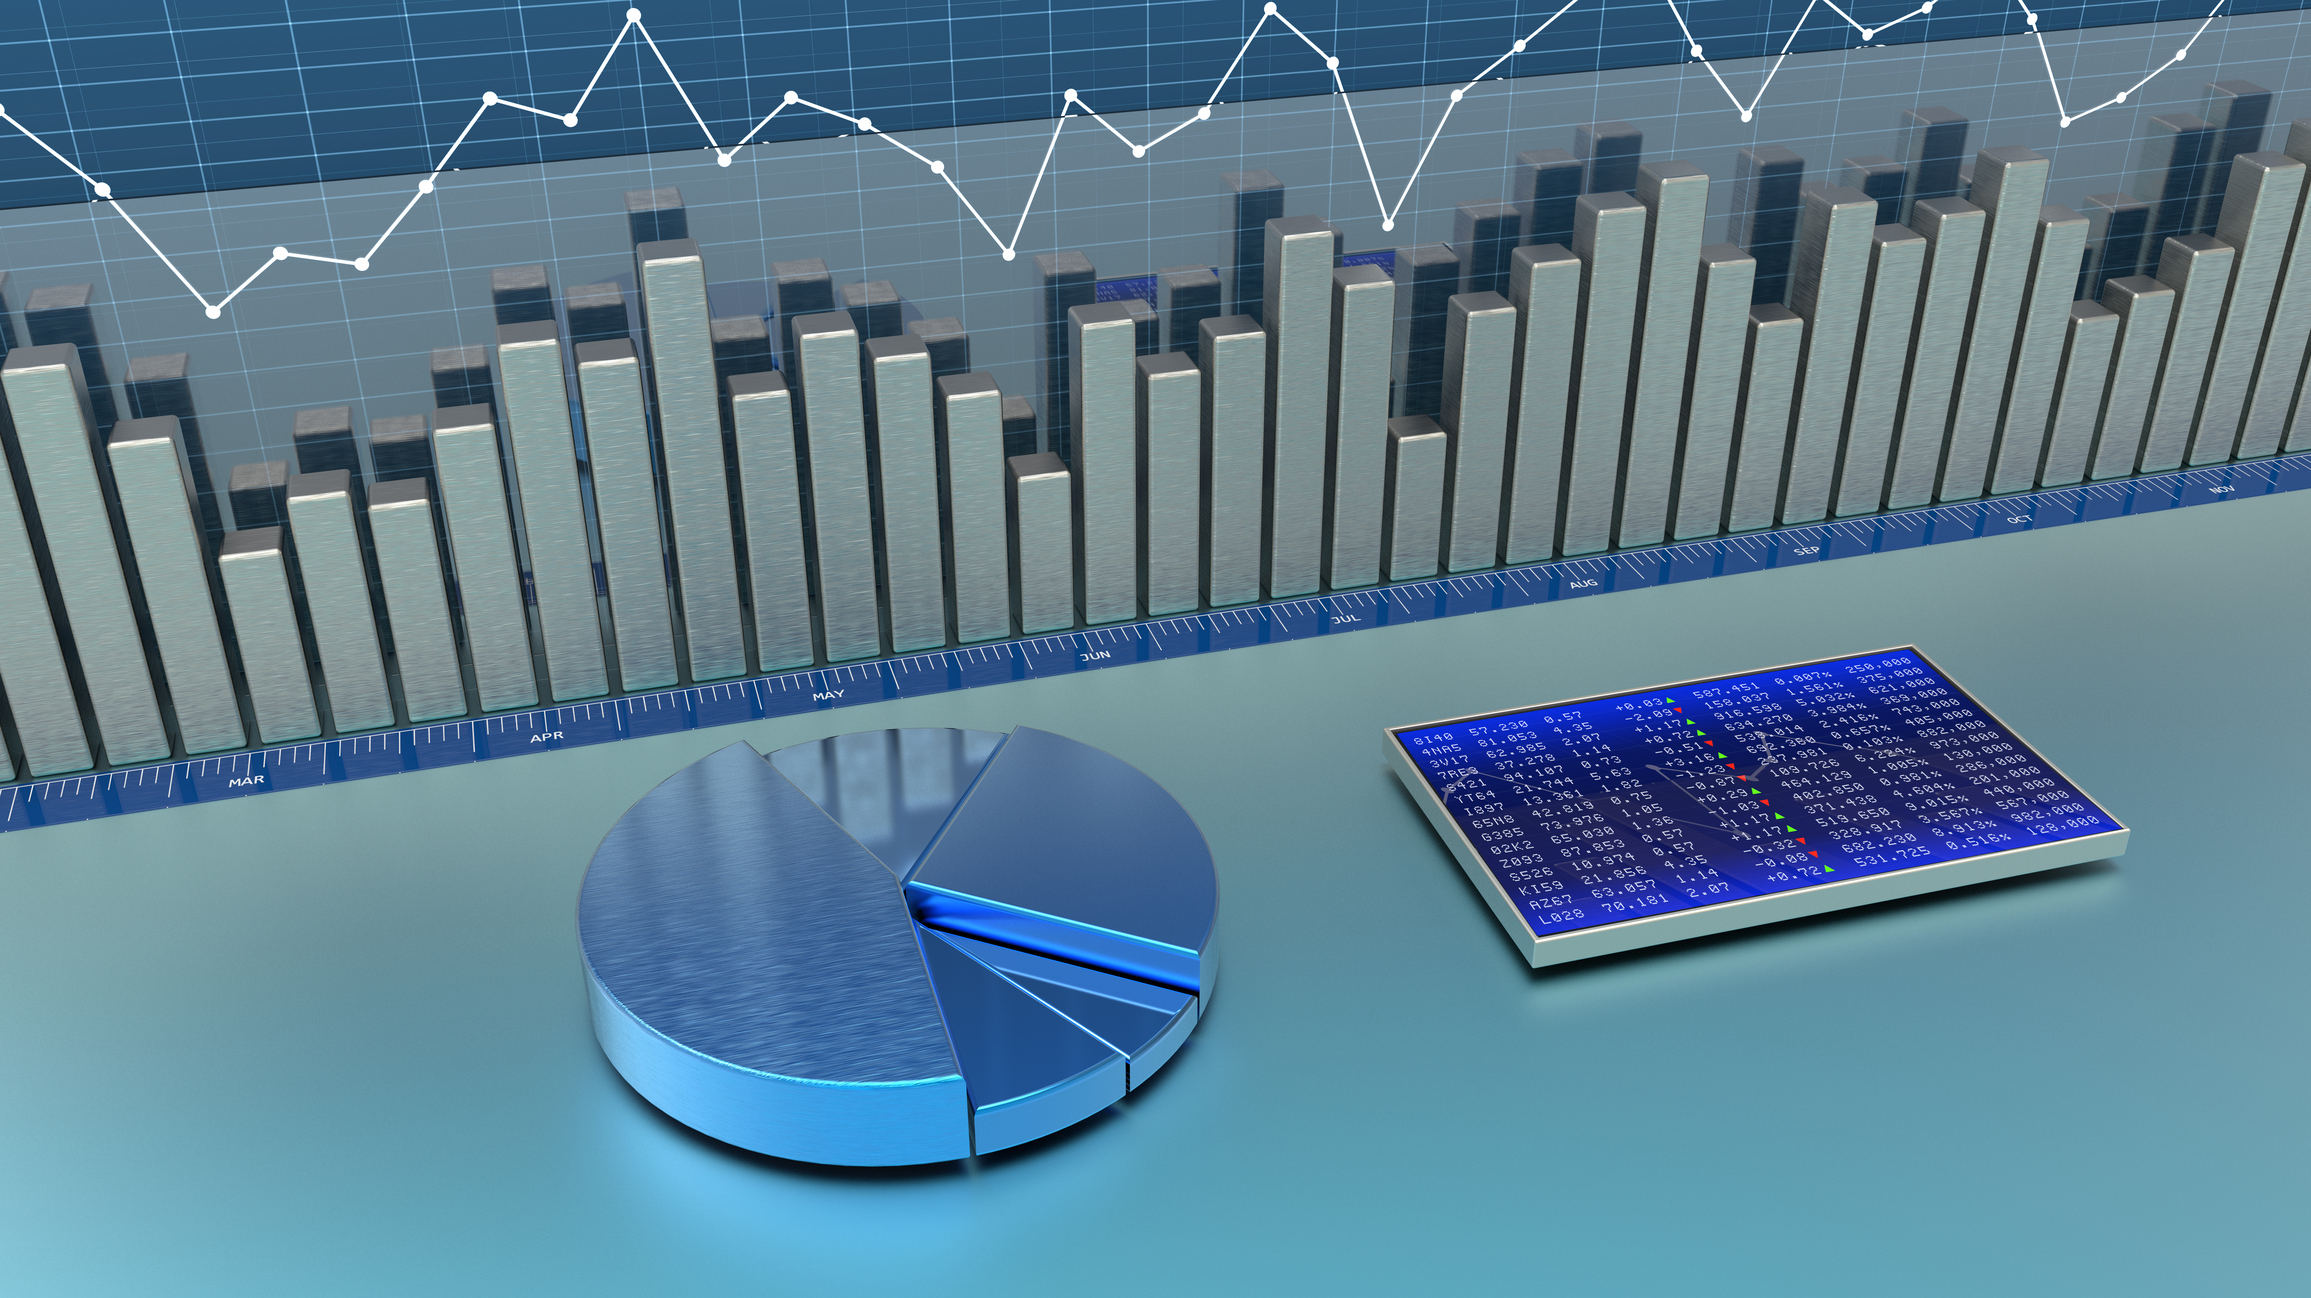 techcrunch.com - Ron Miller - Sisense hauls in $80M investment as data analytics business matures